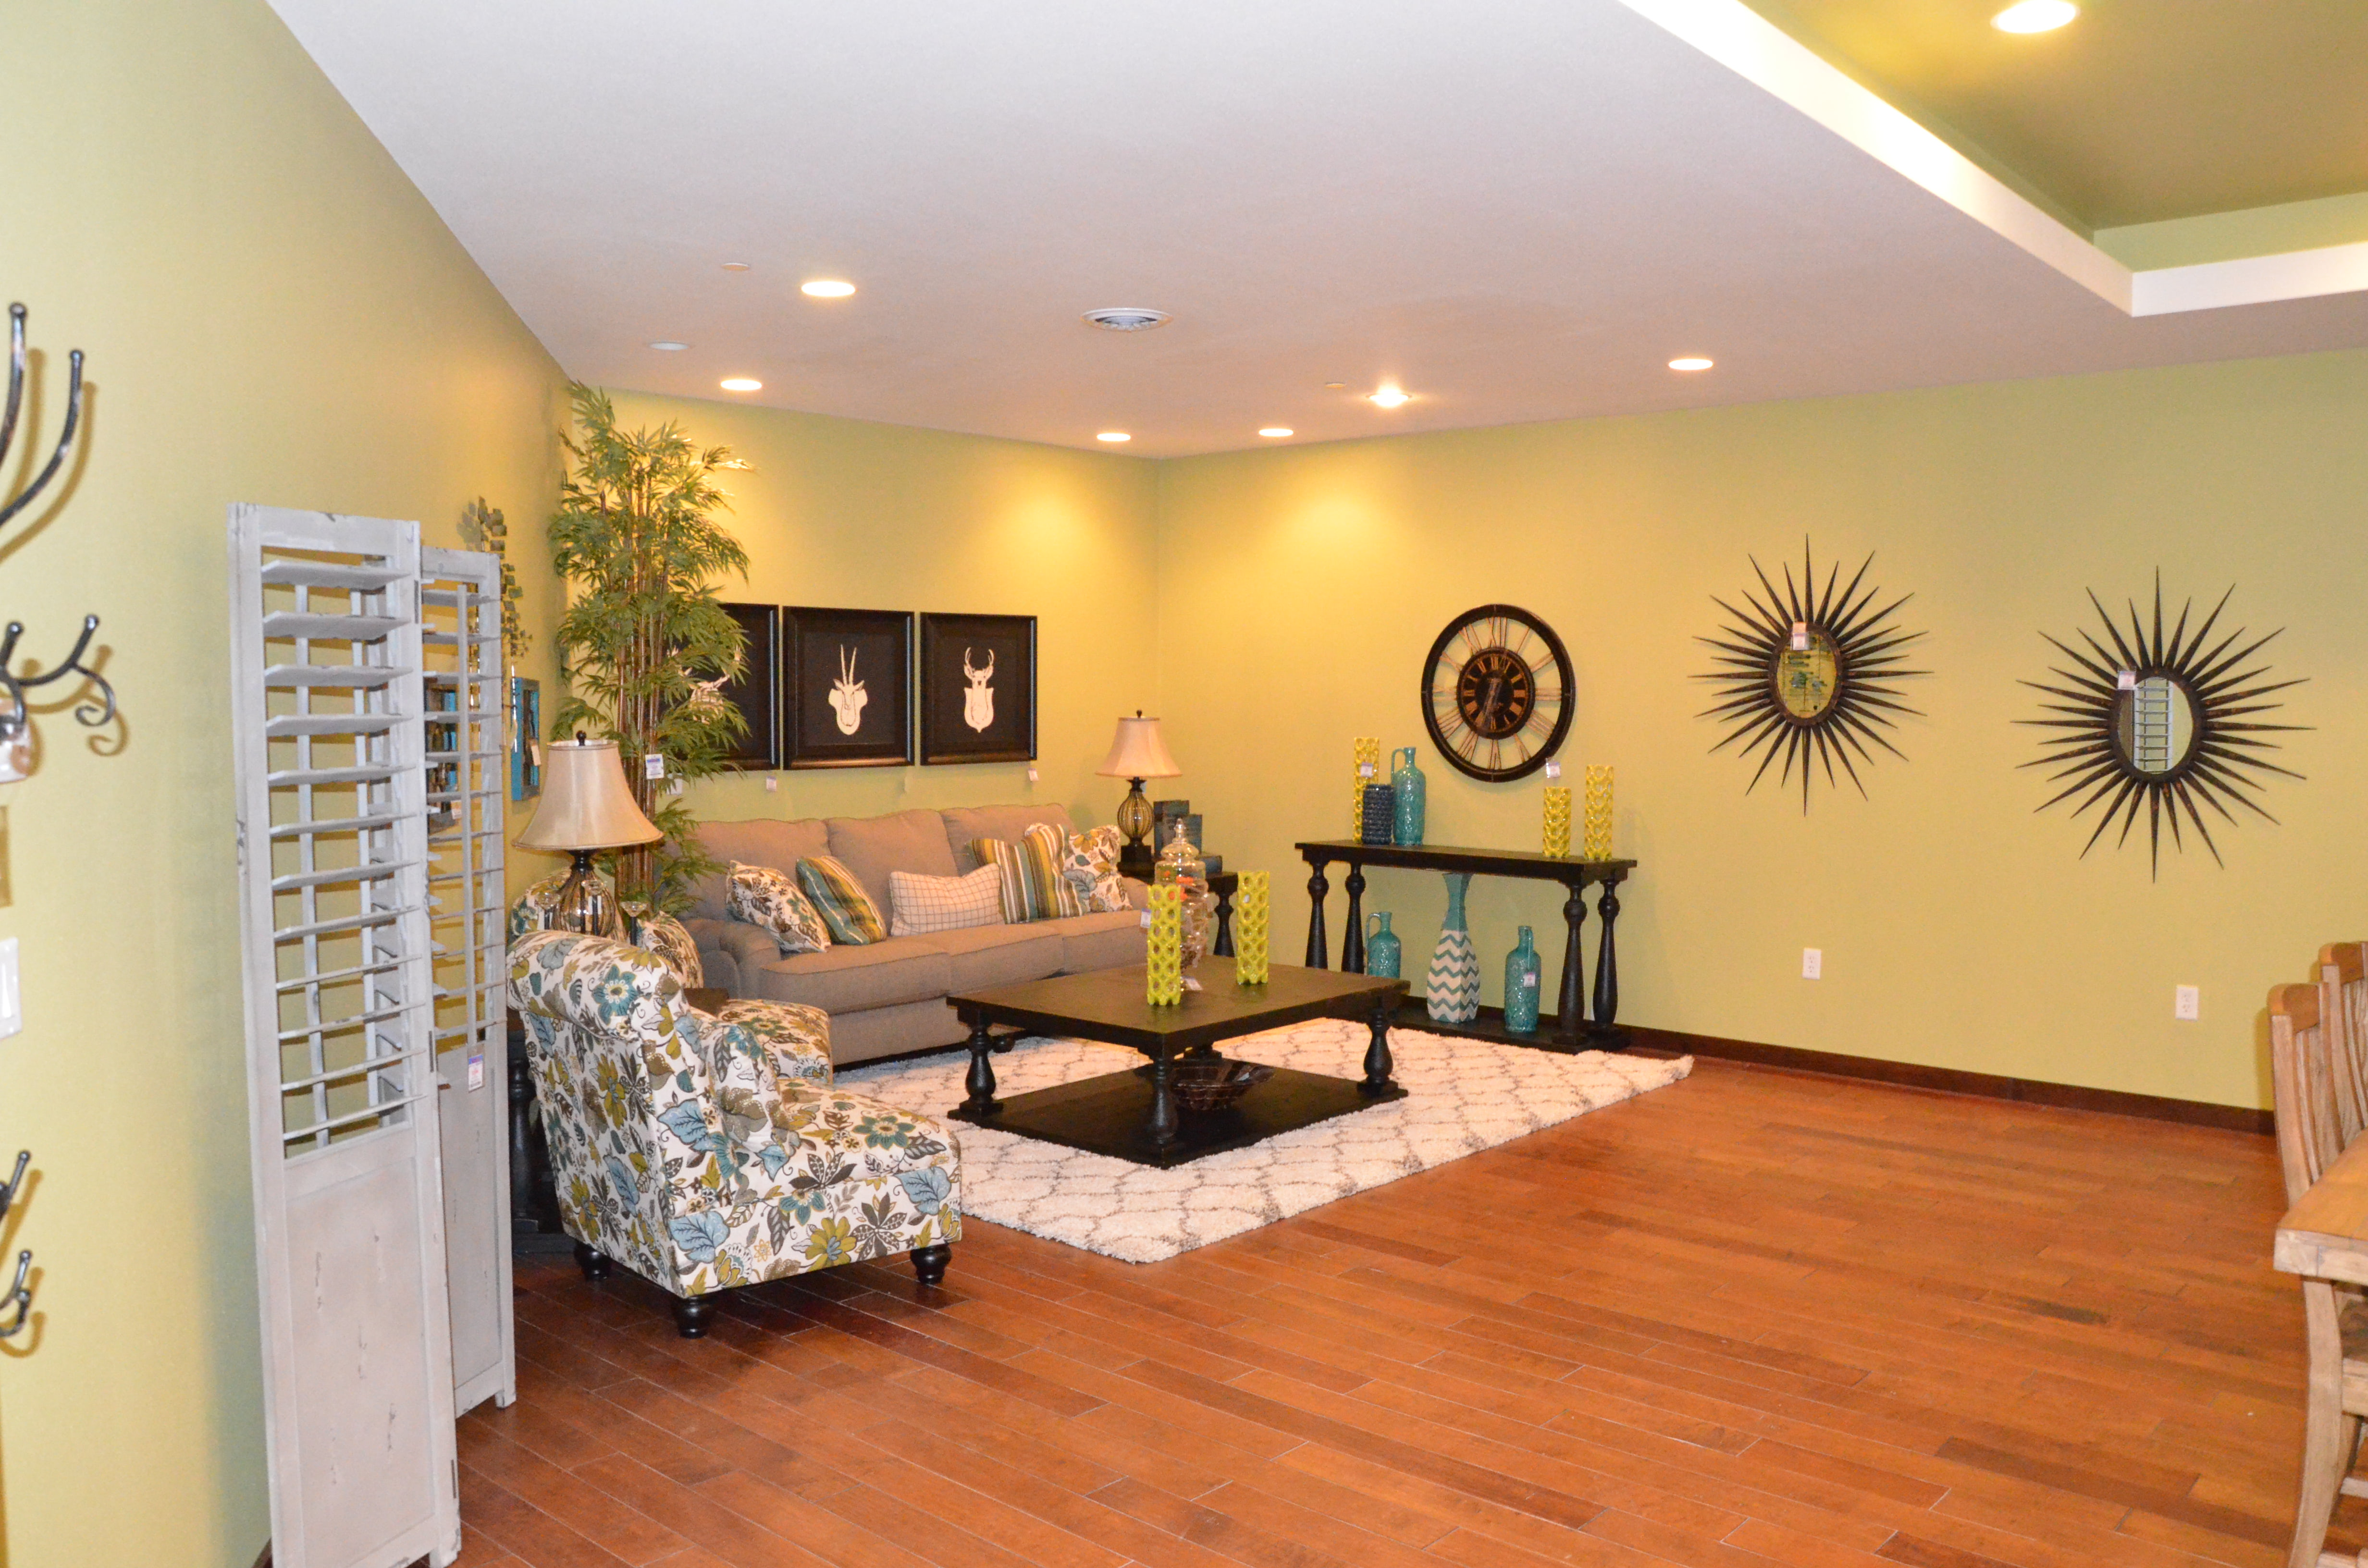 Furniture & ApplianceMart interior renovation